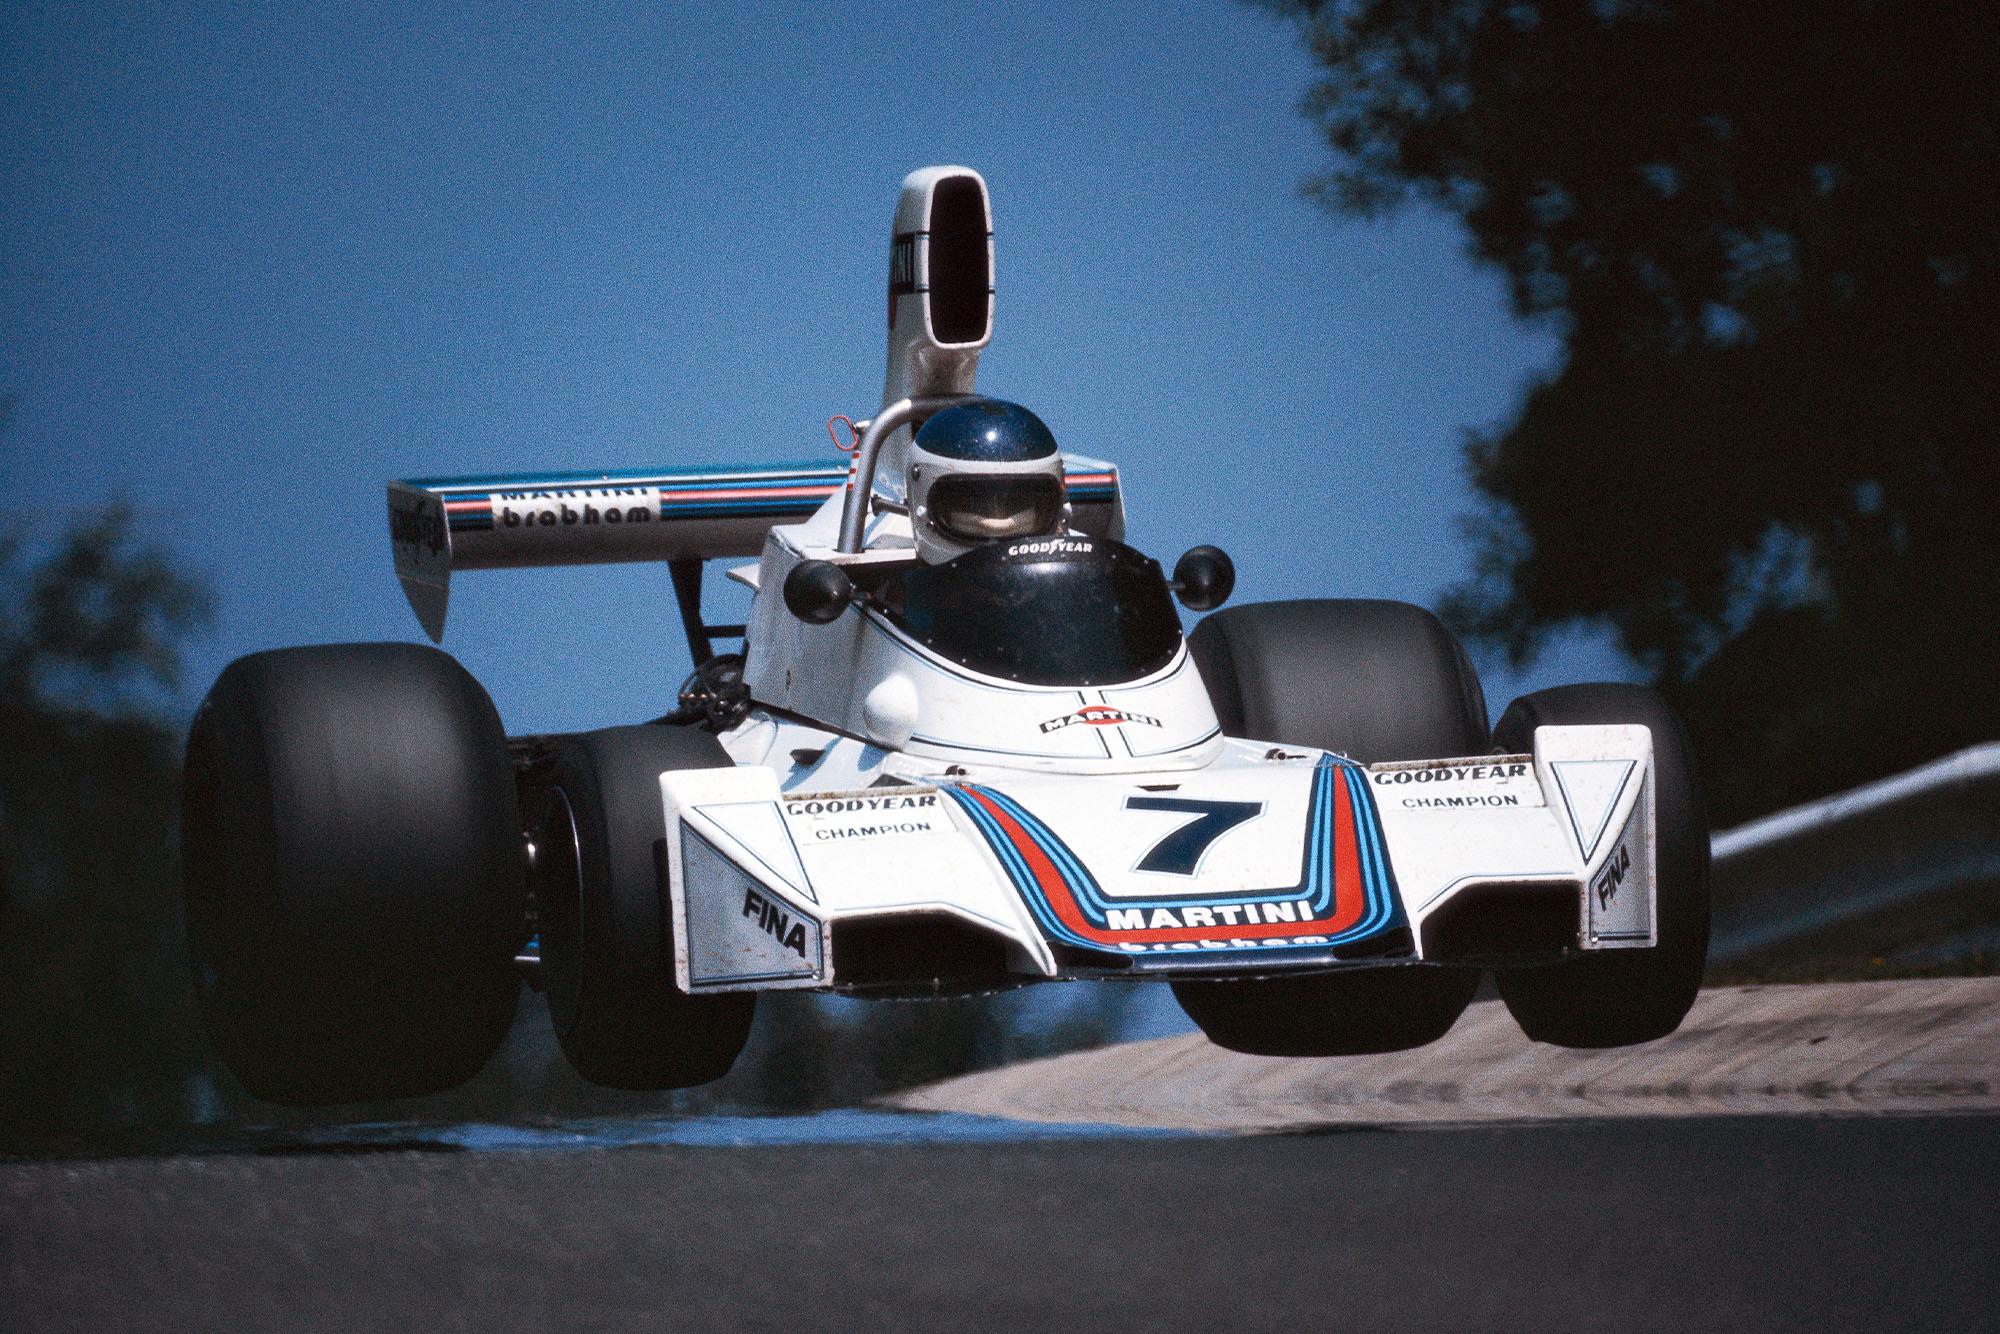 Carlos Reutemann's Brabham takes flight at the 1975 German Grand Prix, Nurburgring.